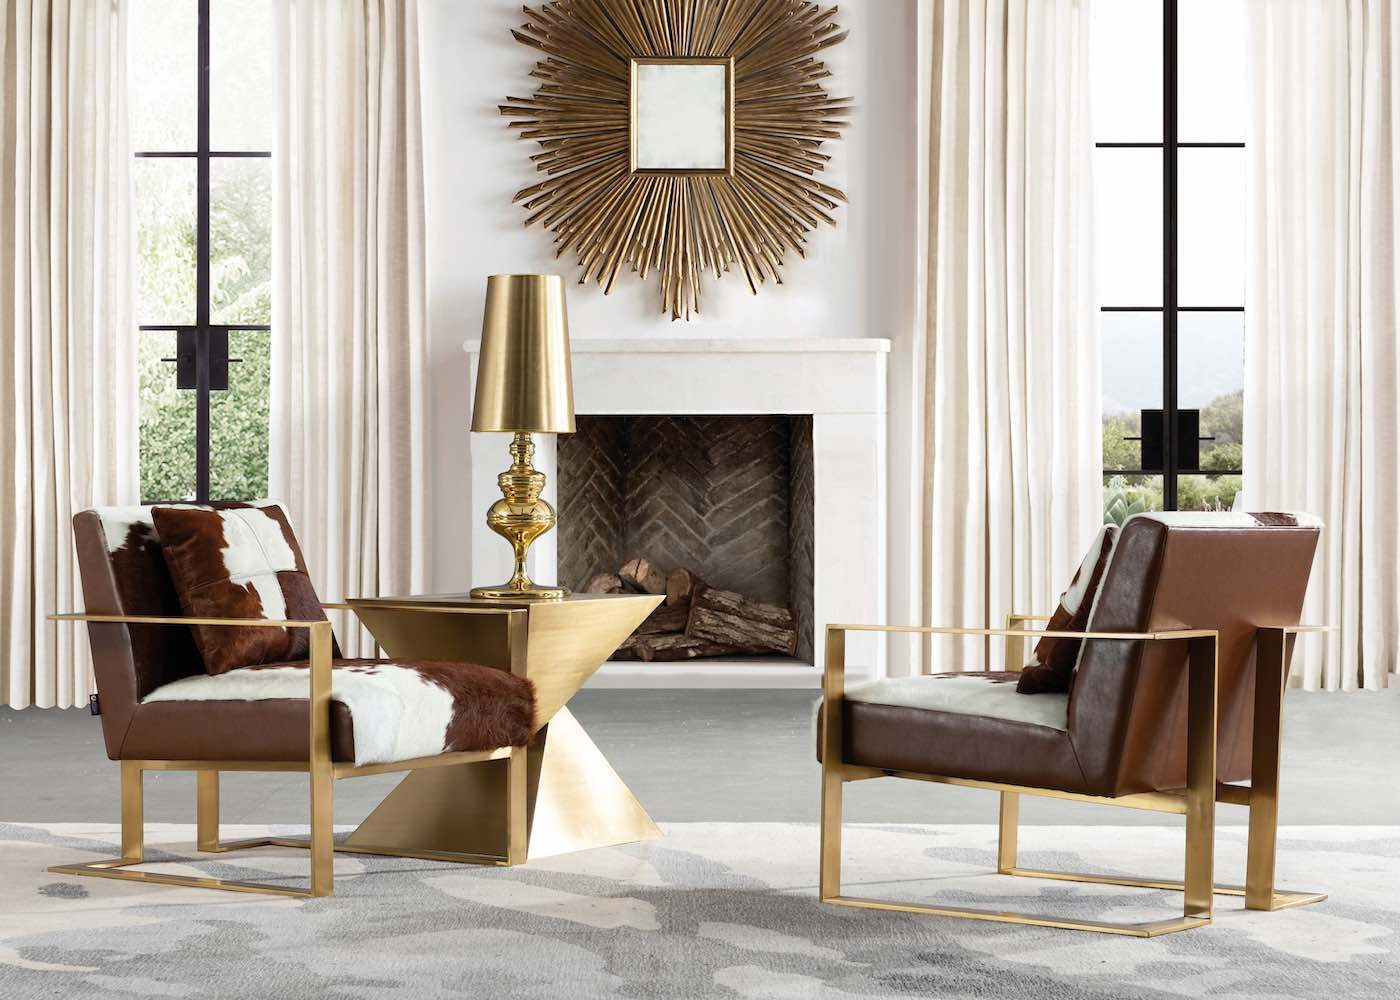 mazarin-ameublement-catalogue-produits-chaise-fauteuil-18